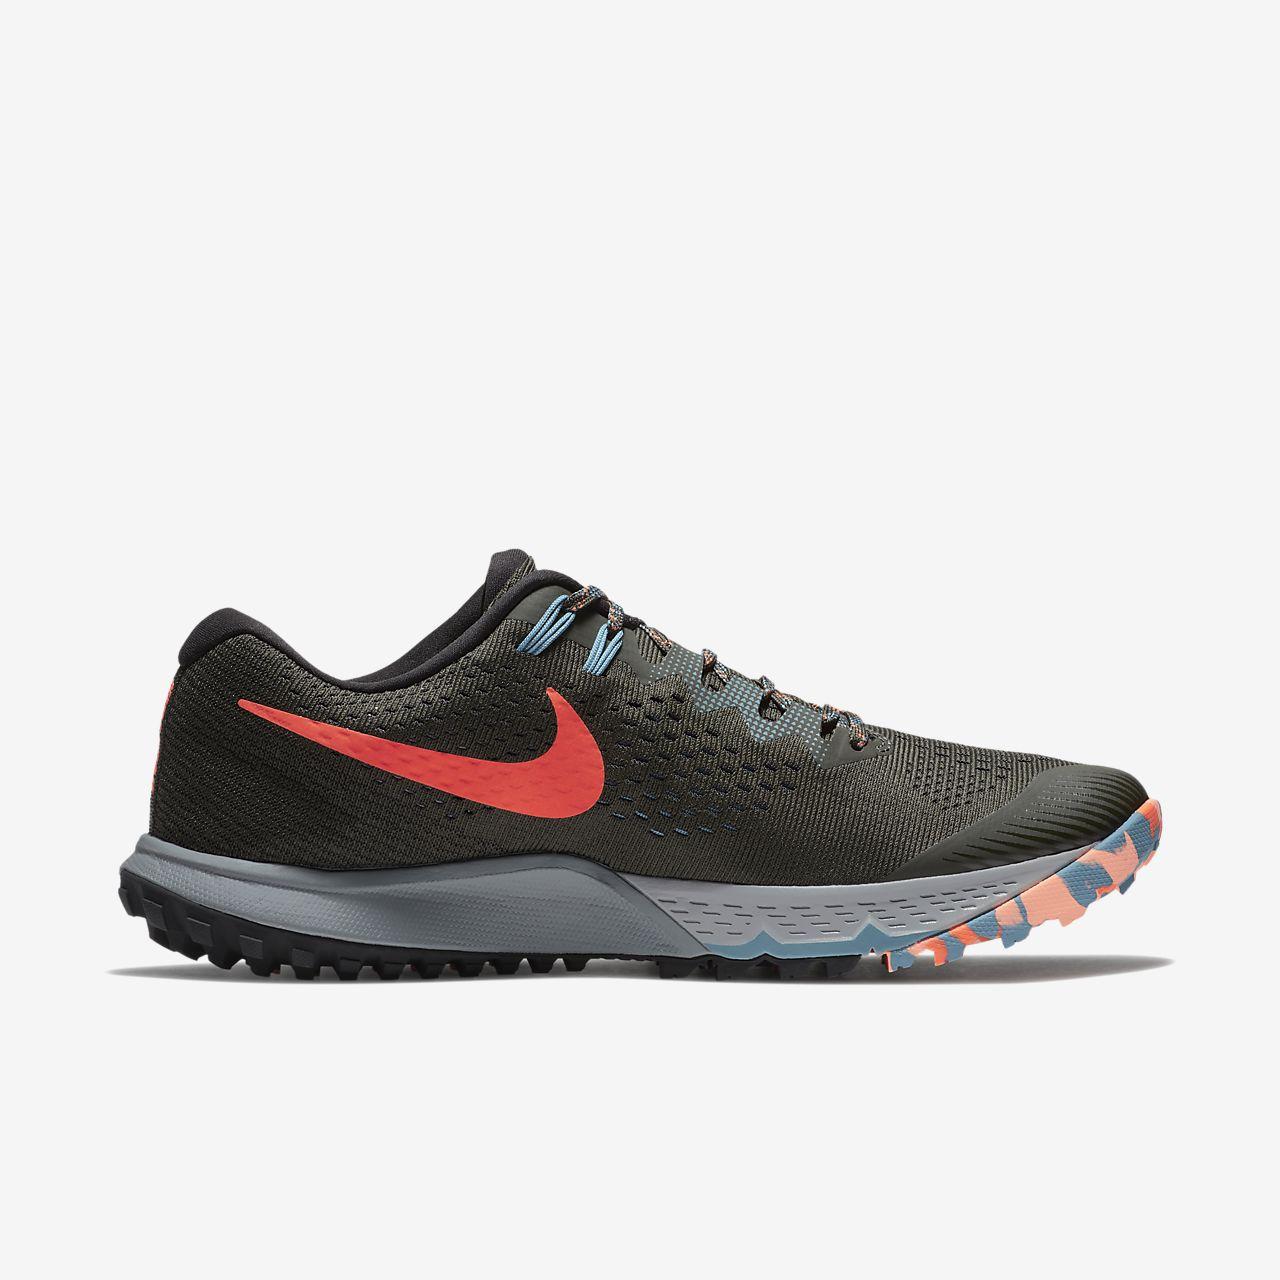 ... Nike Air Zoom Terra Kiger 4 Zapatillas de running - Hombre